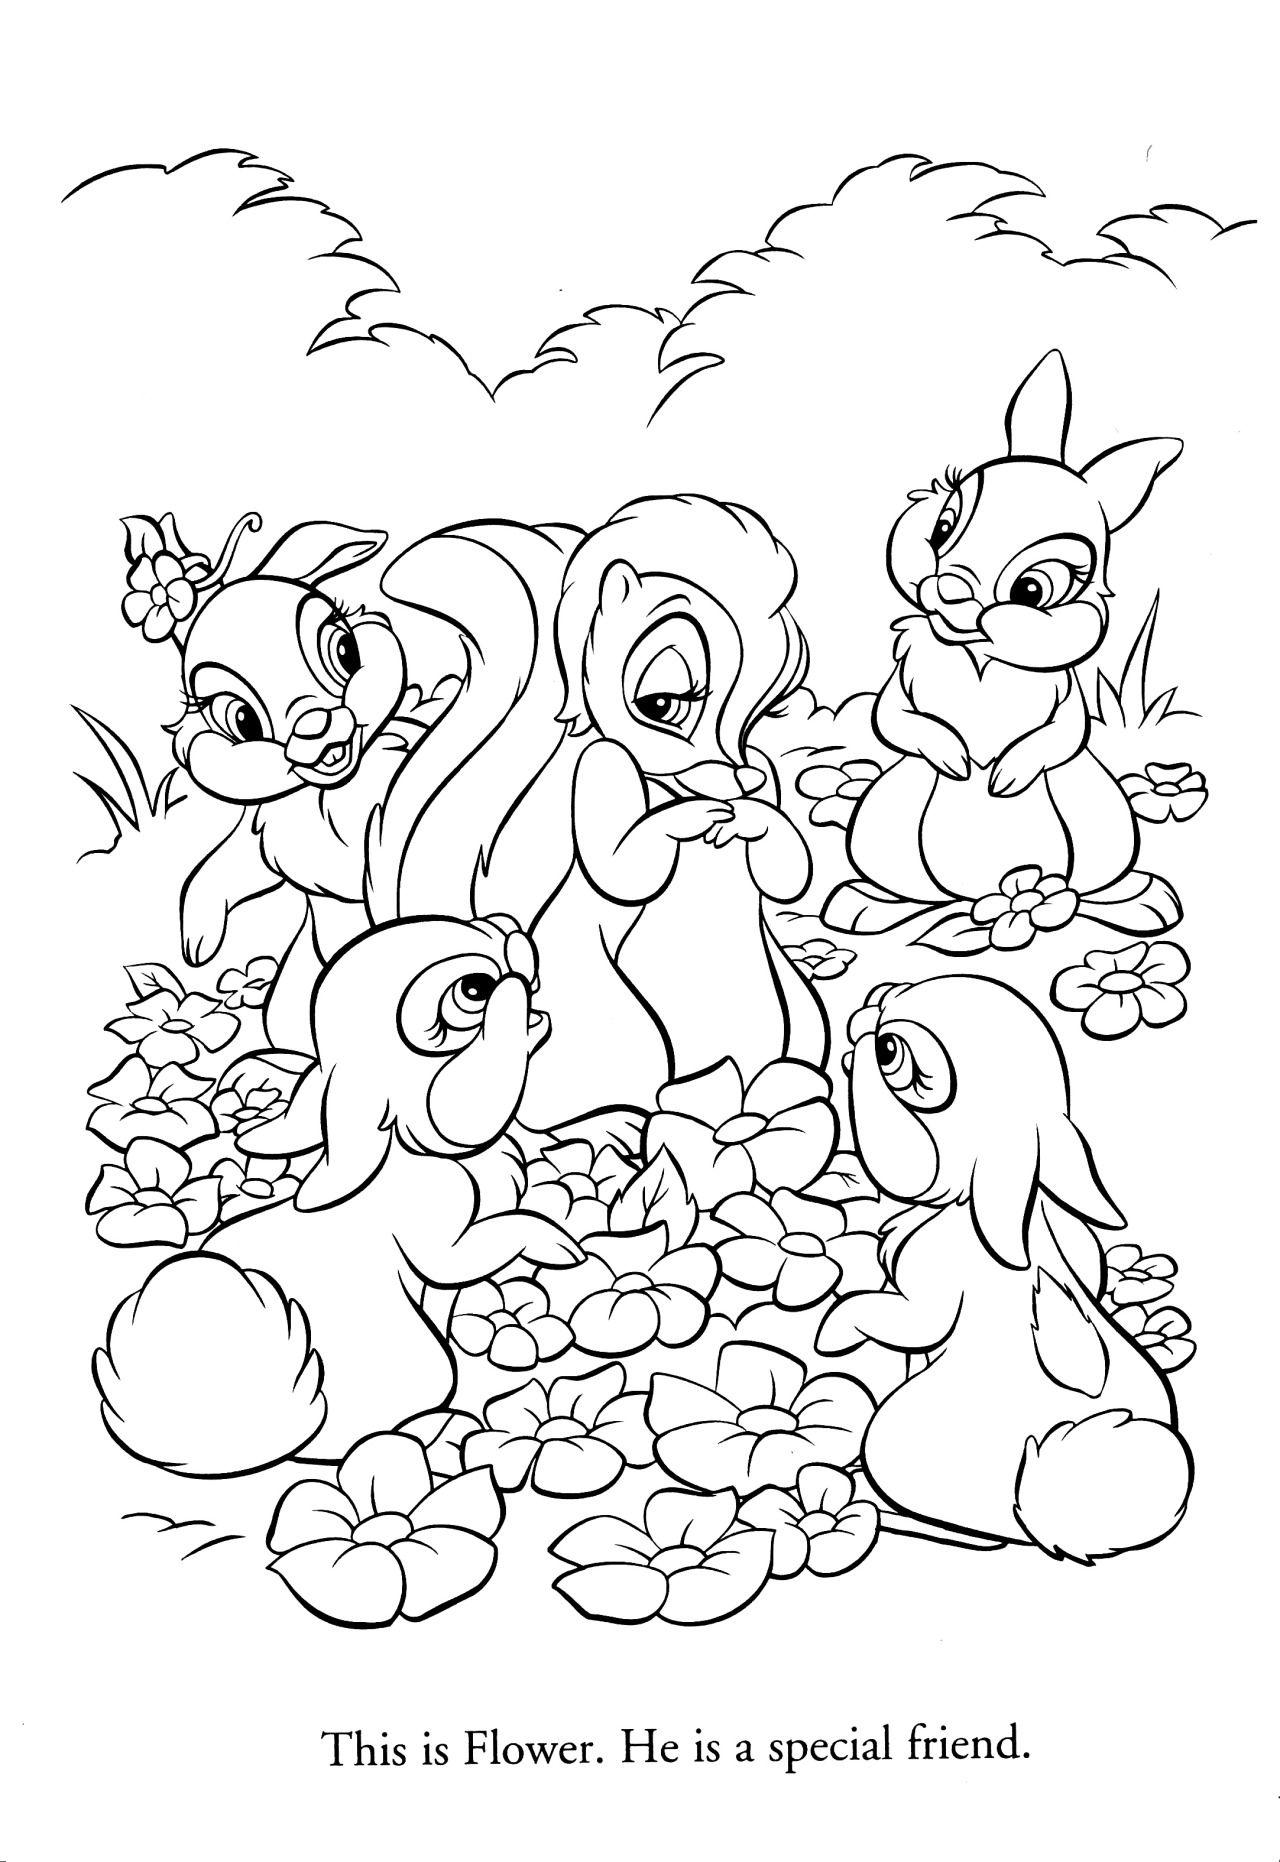 Disney Coloring Pages | Coloring Pges | Pinterest | Mandalas ...